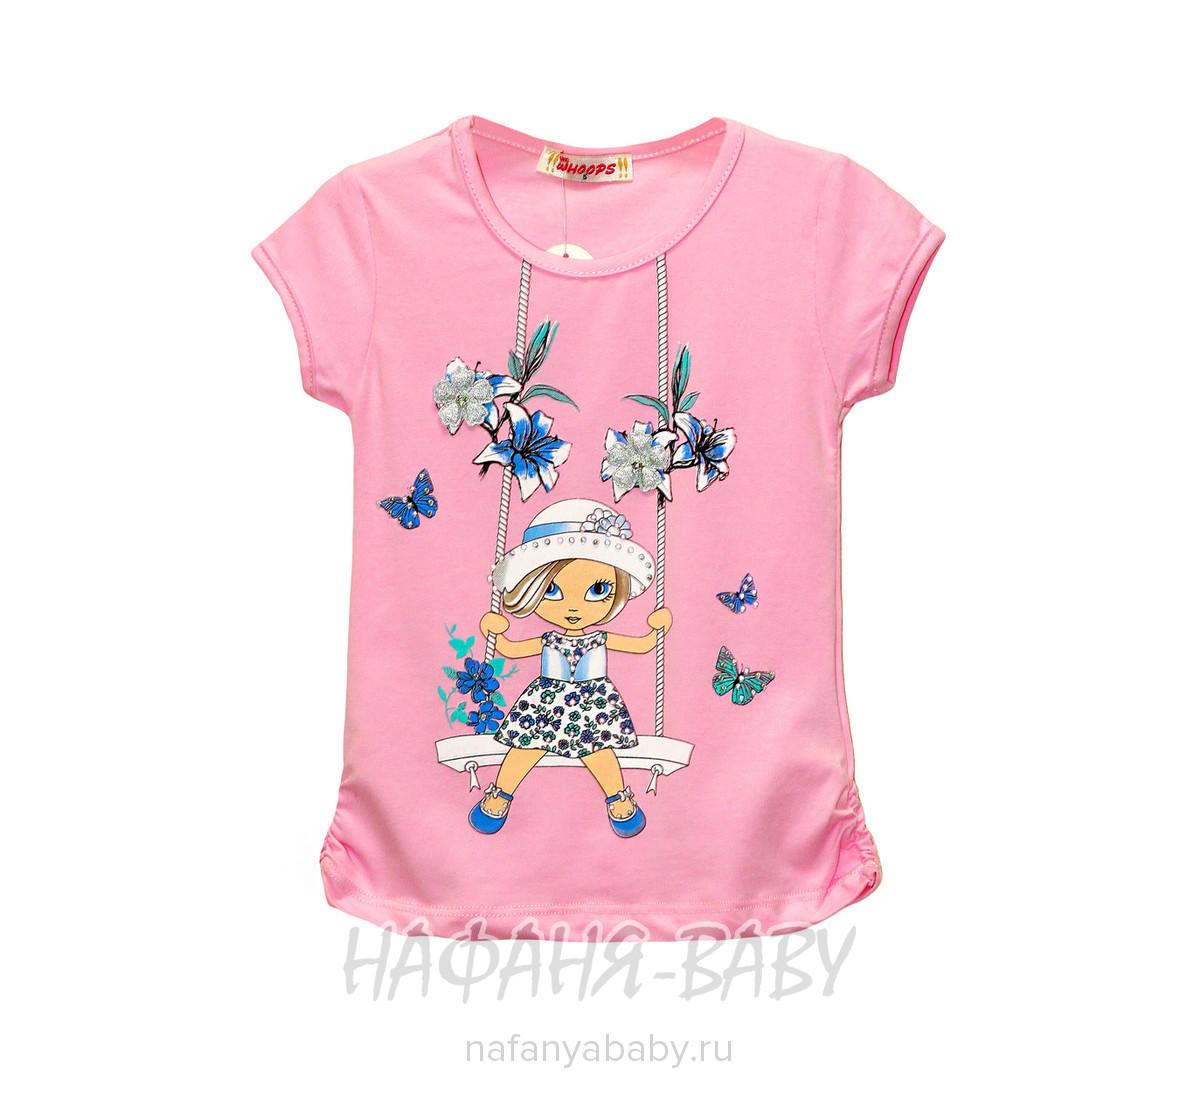 Детская футболка WHOOPS арт: 4103, 1-4 года, 5-9 лет, цвет желтый, оптом Турция